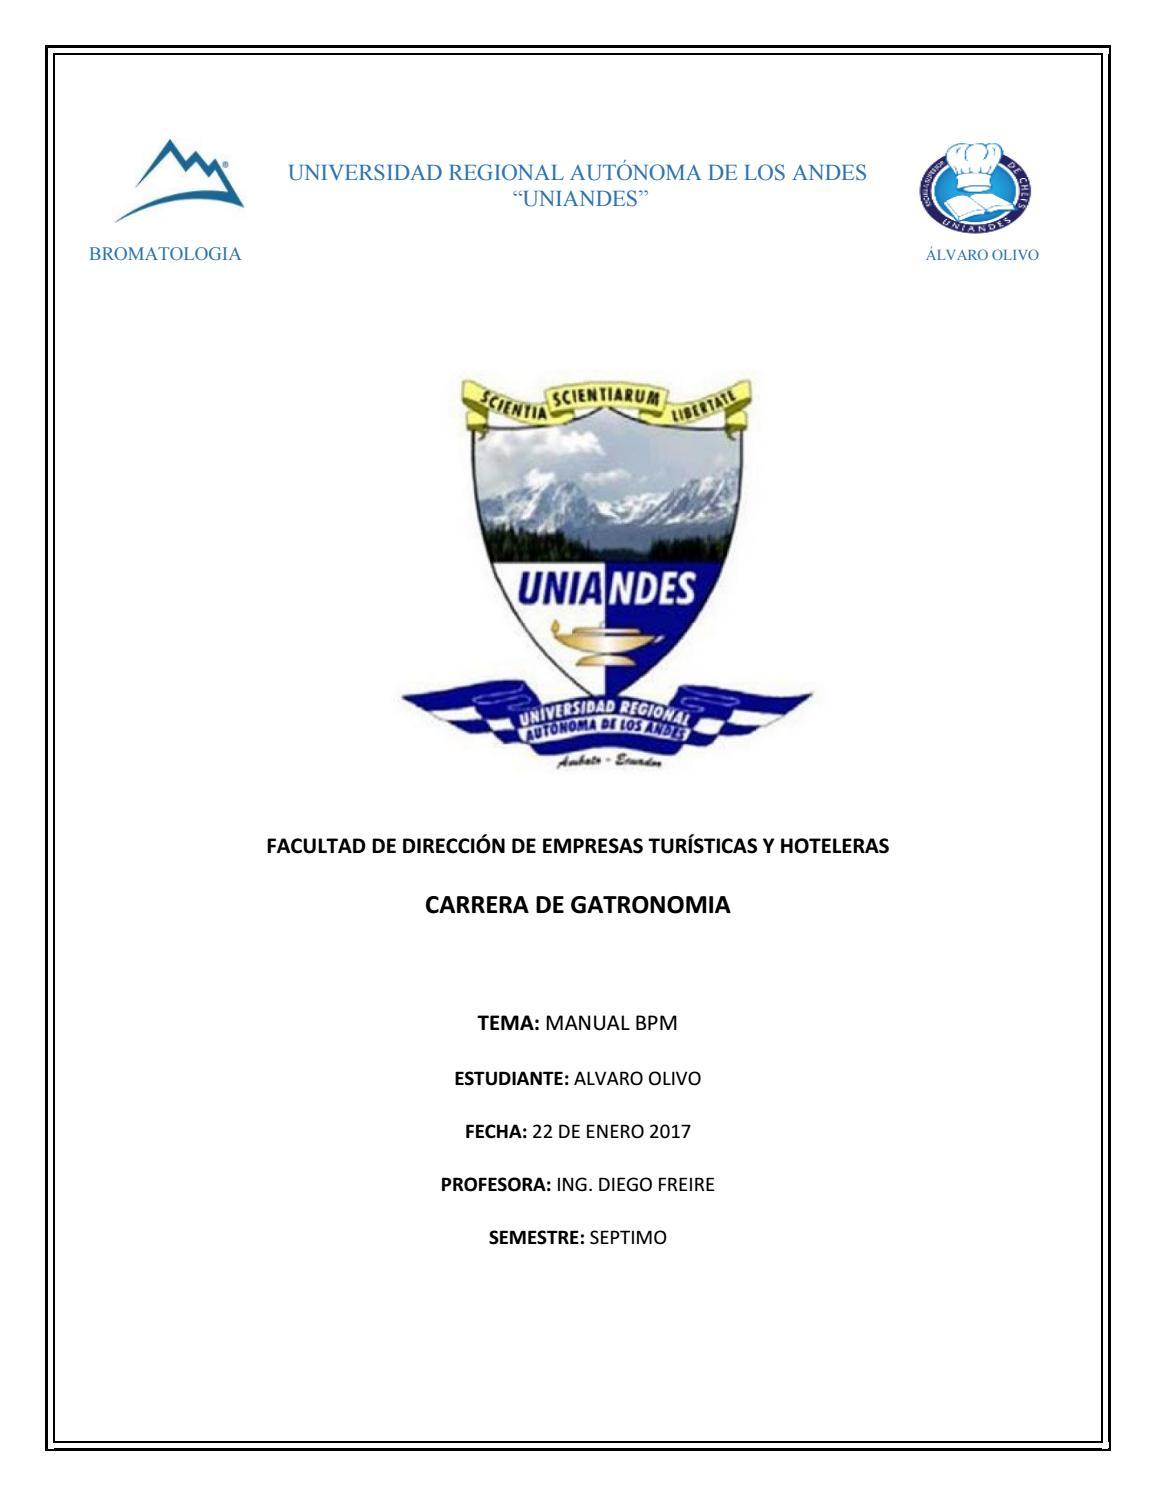 Manual de bpm para producto final by Alvaro Olivo - issuu